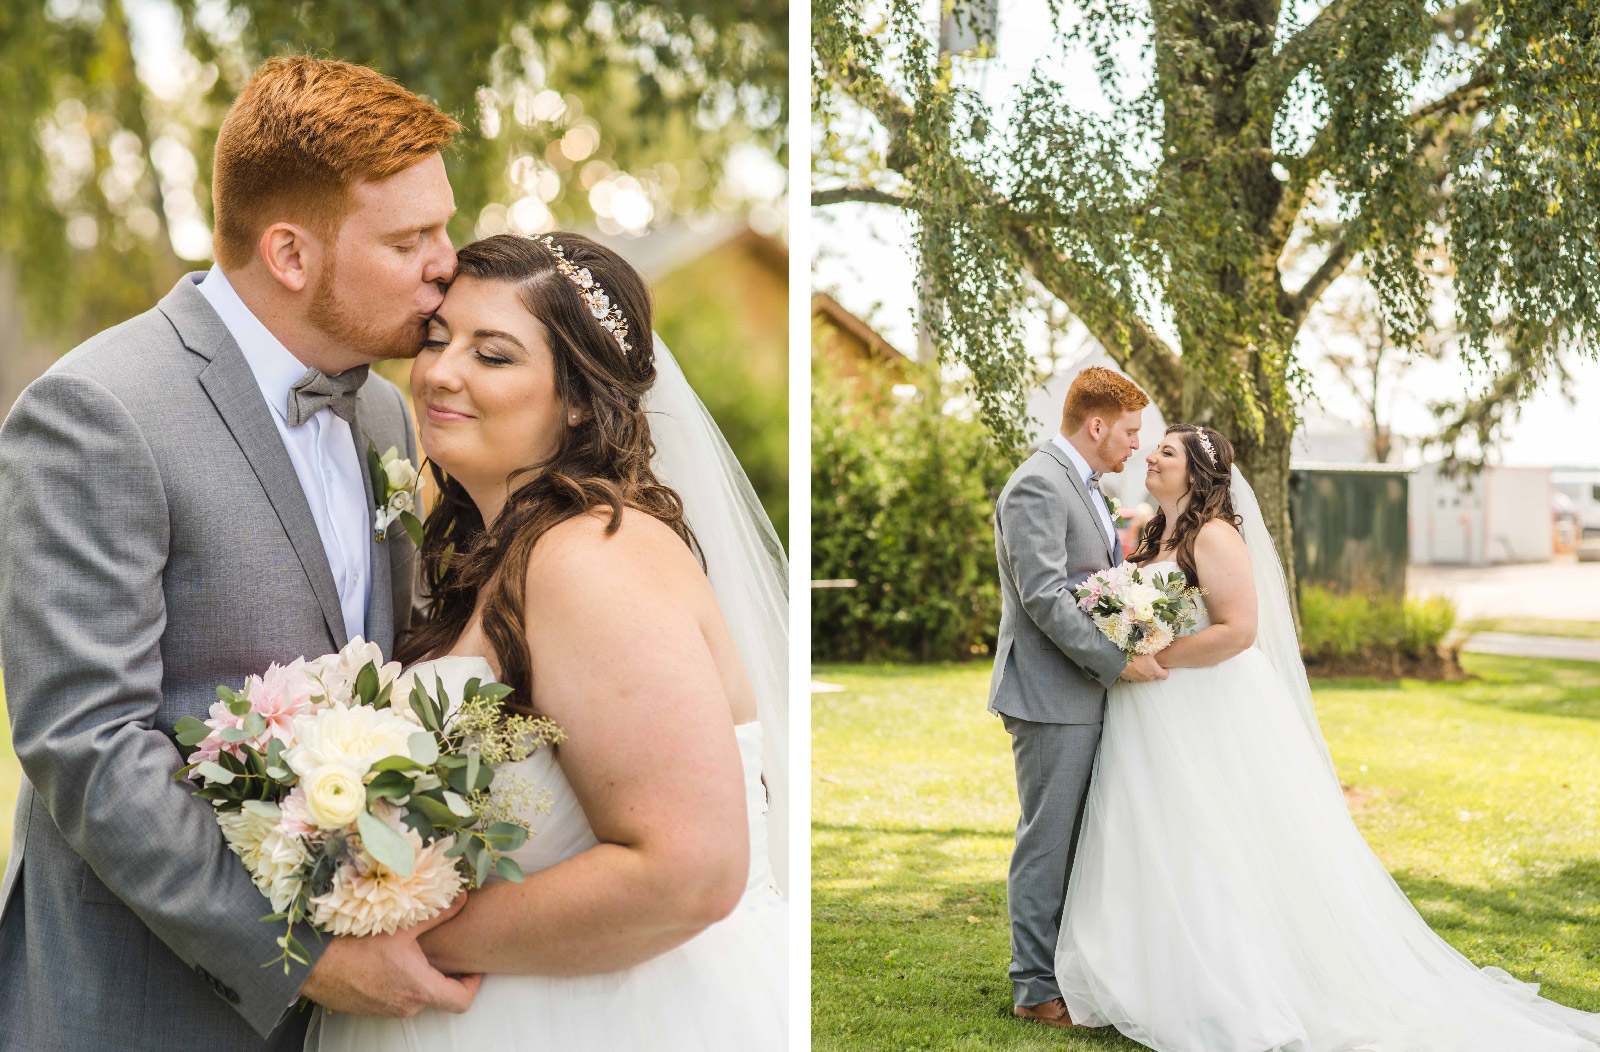 James & Laura Portraits Hush Hush Photography & Film Aidan Hennebry Hamilton Wedding Photographer Videographer-01.jpg